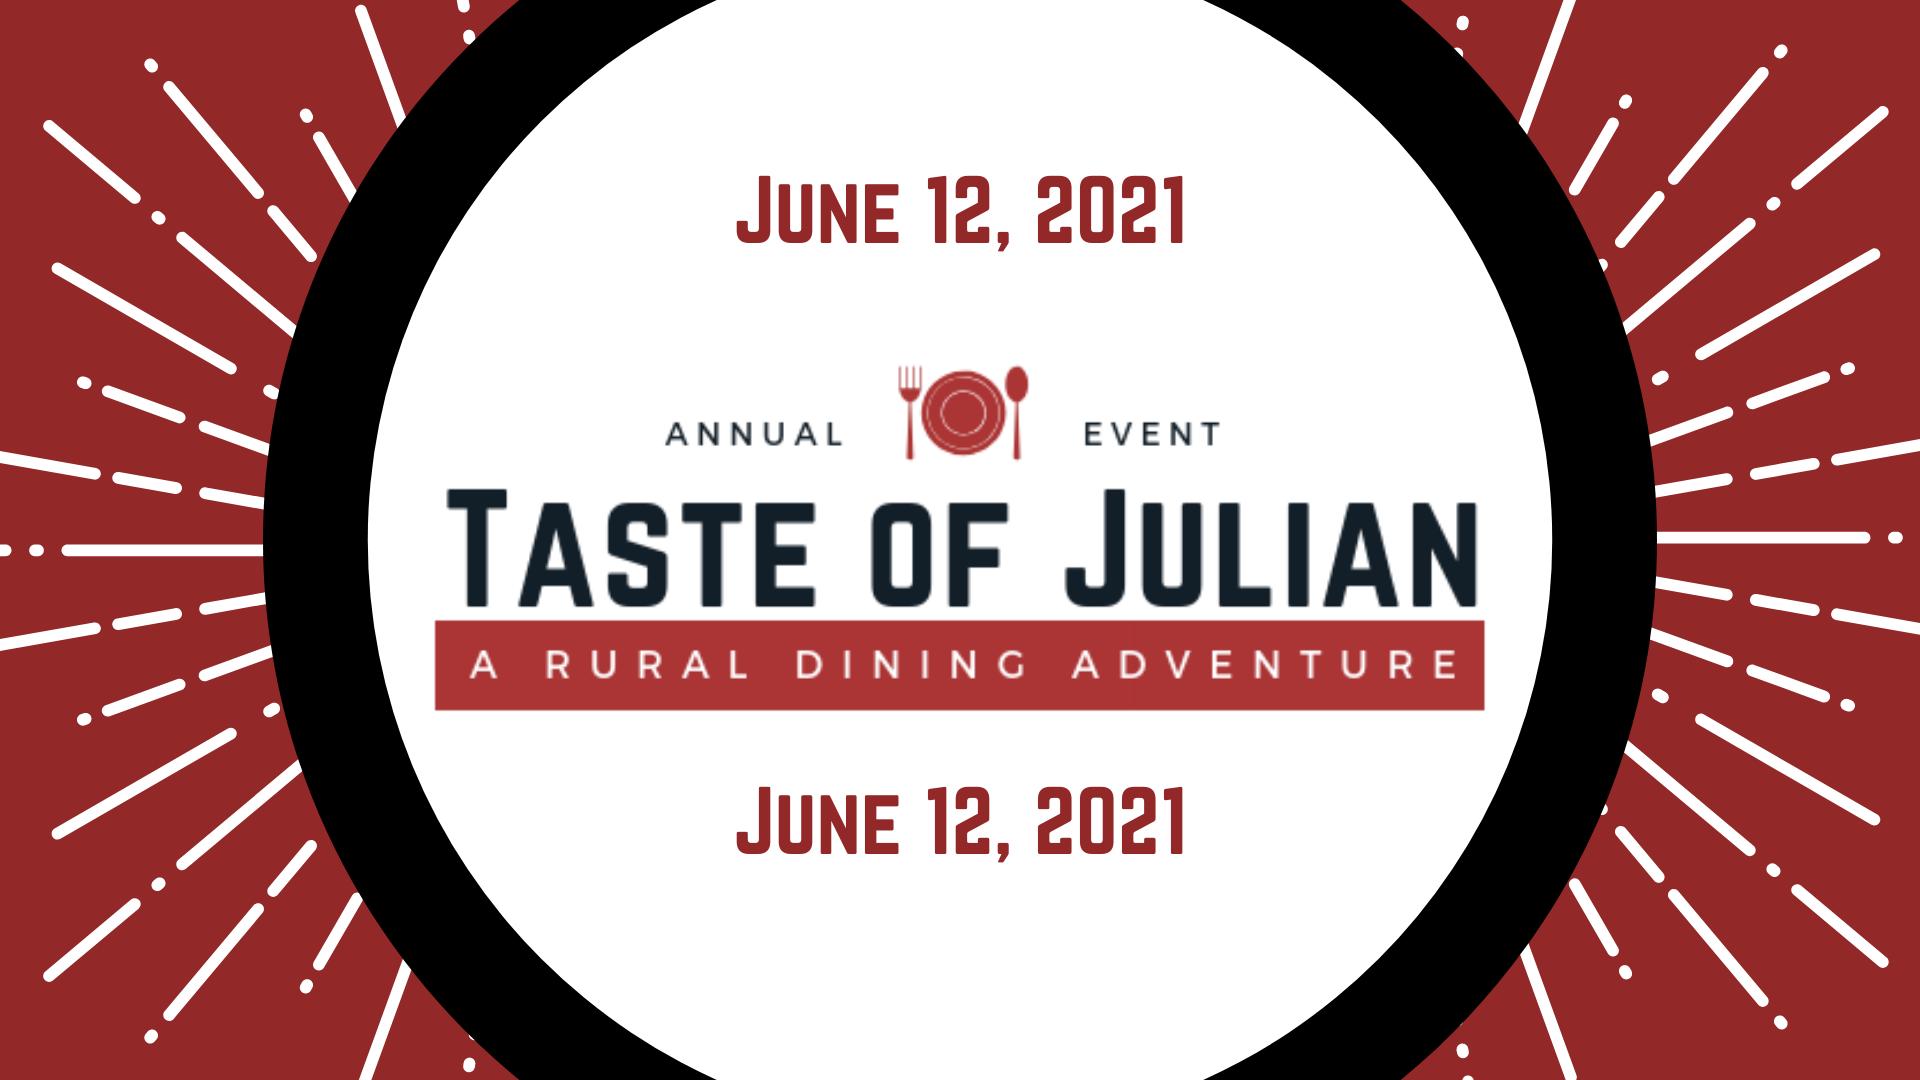 Taste of Julian 2021 event header